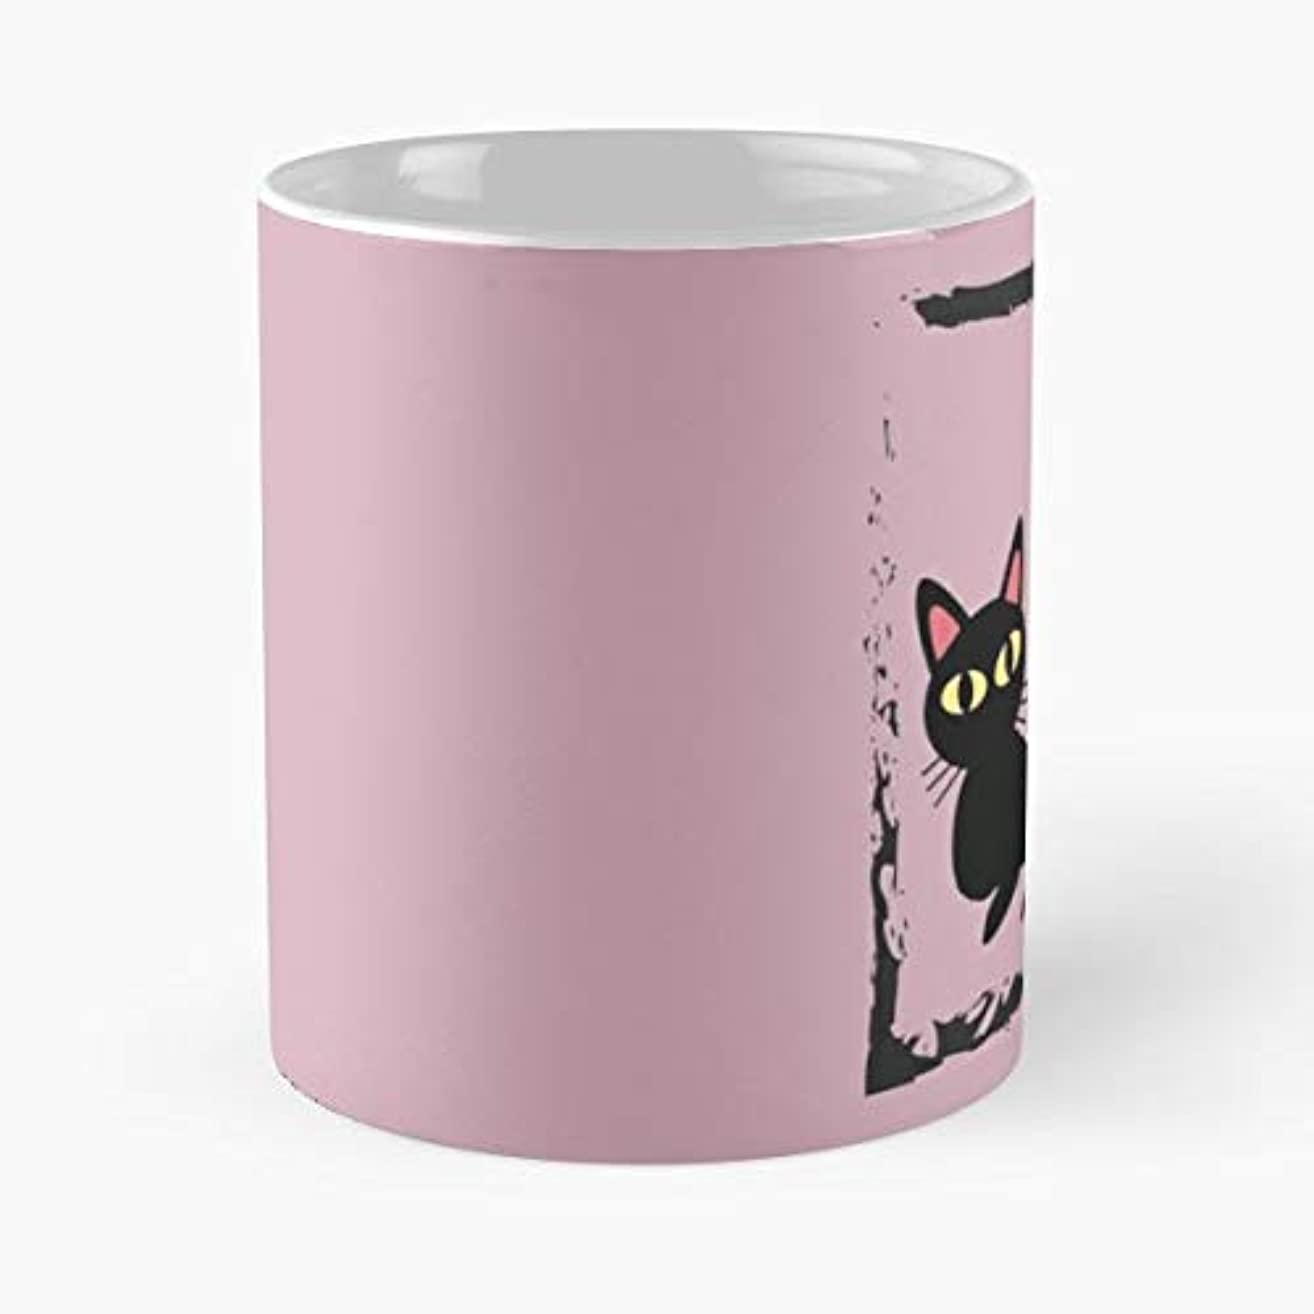 Cat Cats Neko Blackcat -funny Gifts For Men And Women Gift Coffee Mug Tea Cup White-11 Oz.